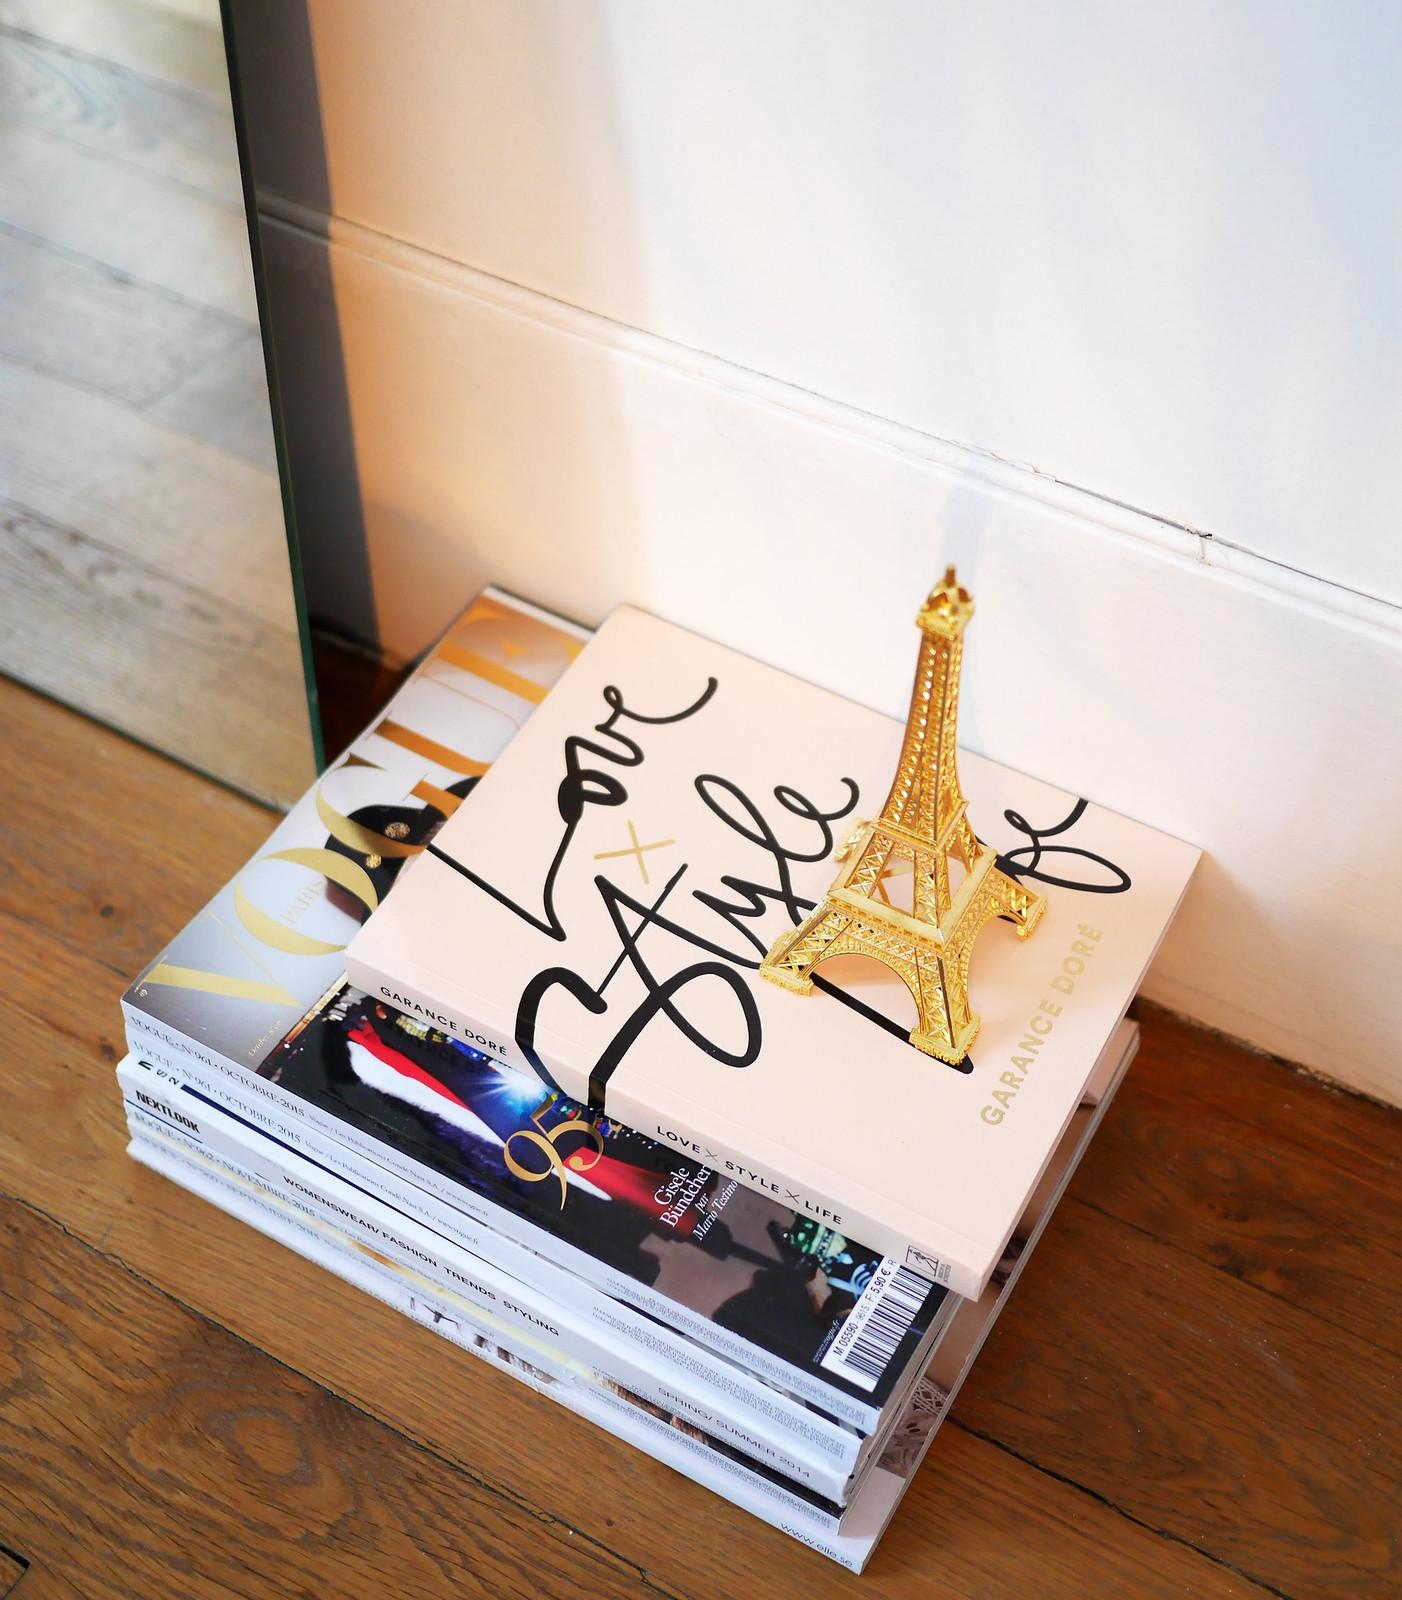 My Parisian home